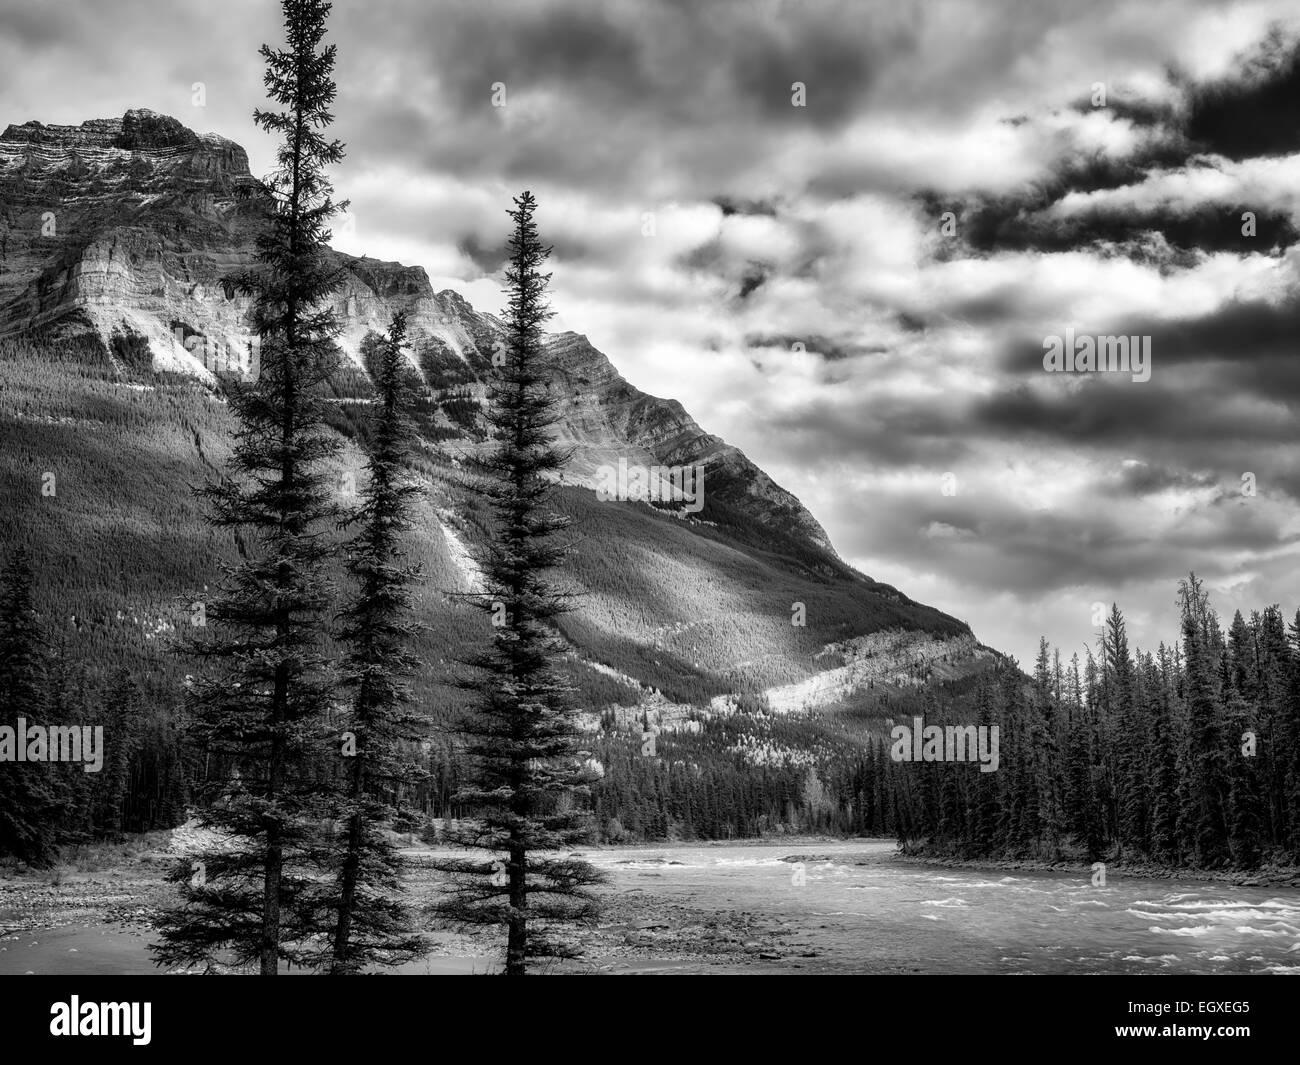 Athebasca-Fluss und die Berge. Jasper Nationalpark, Alberta, Kanada Stockbild